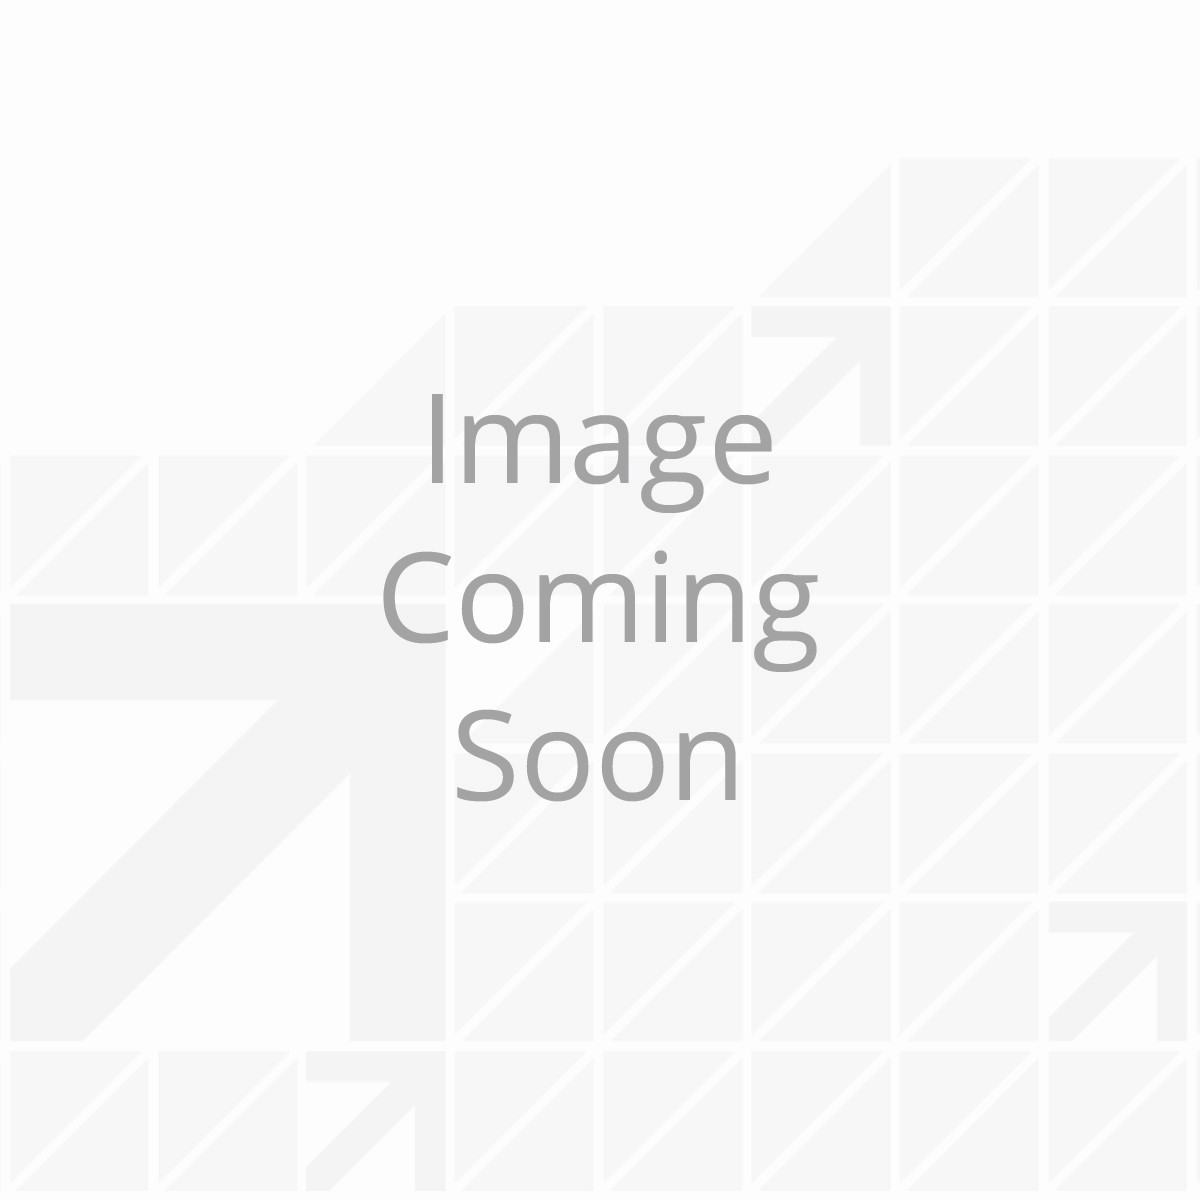 Coaxial TV Cable - 50' (Titanium Grey)